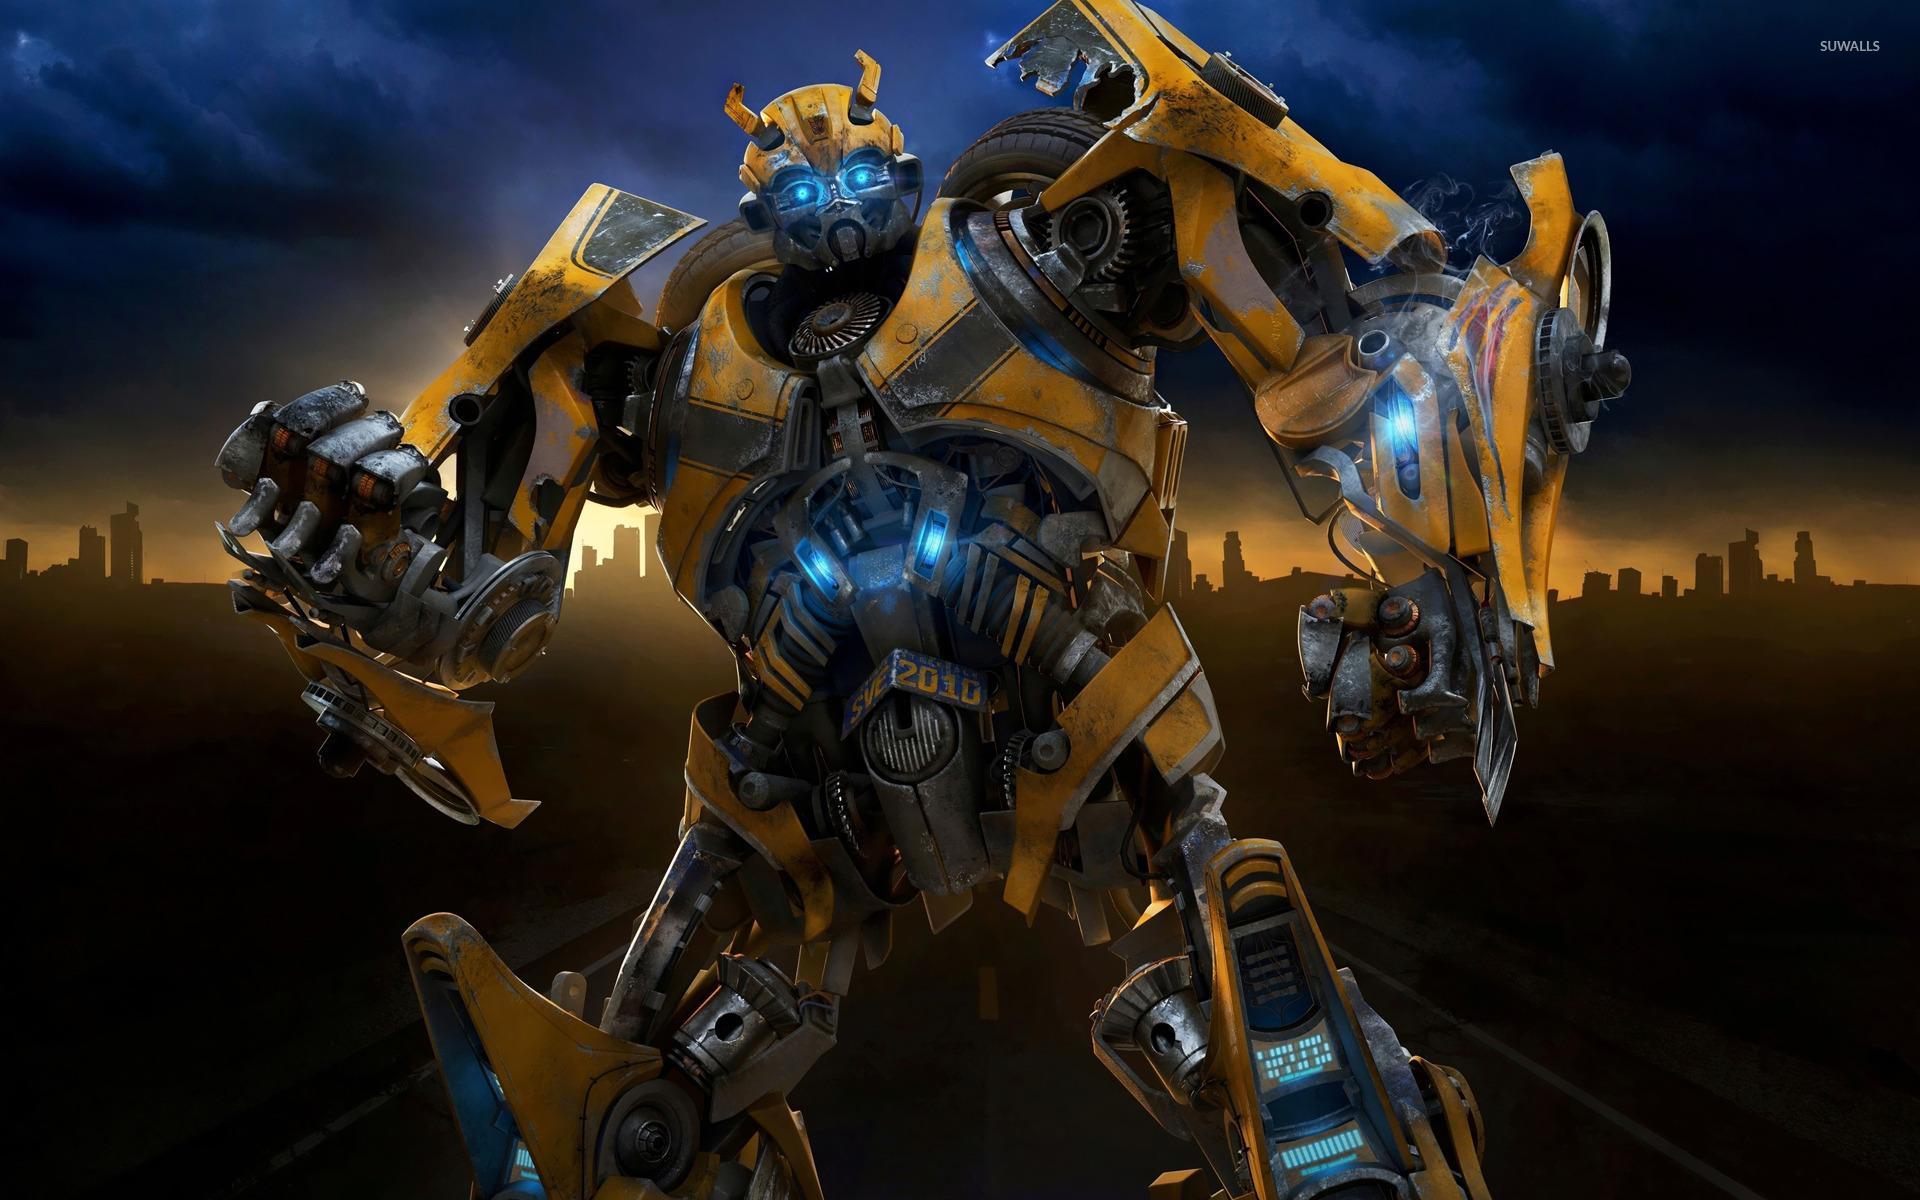 Bumblebee - Transformers [3] wallpaper